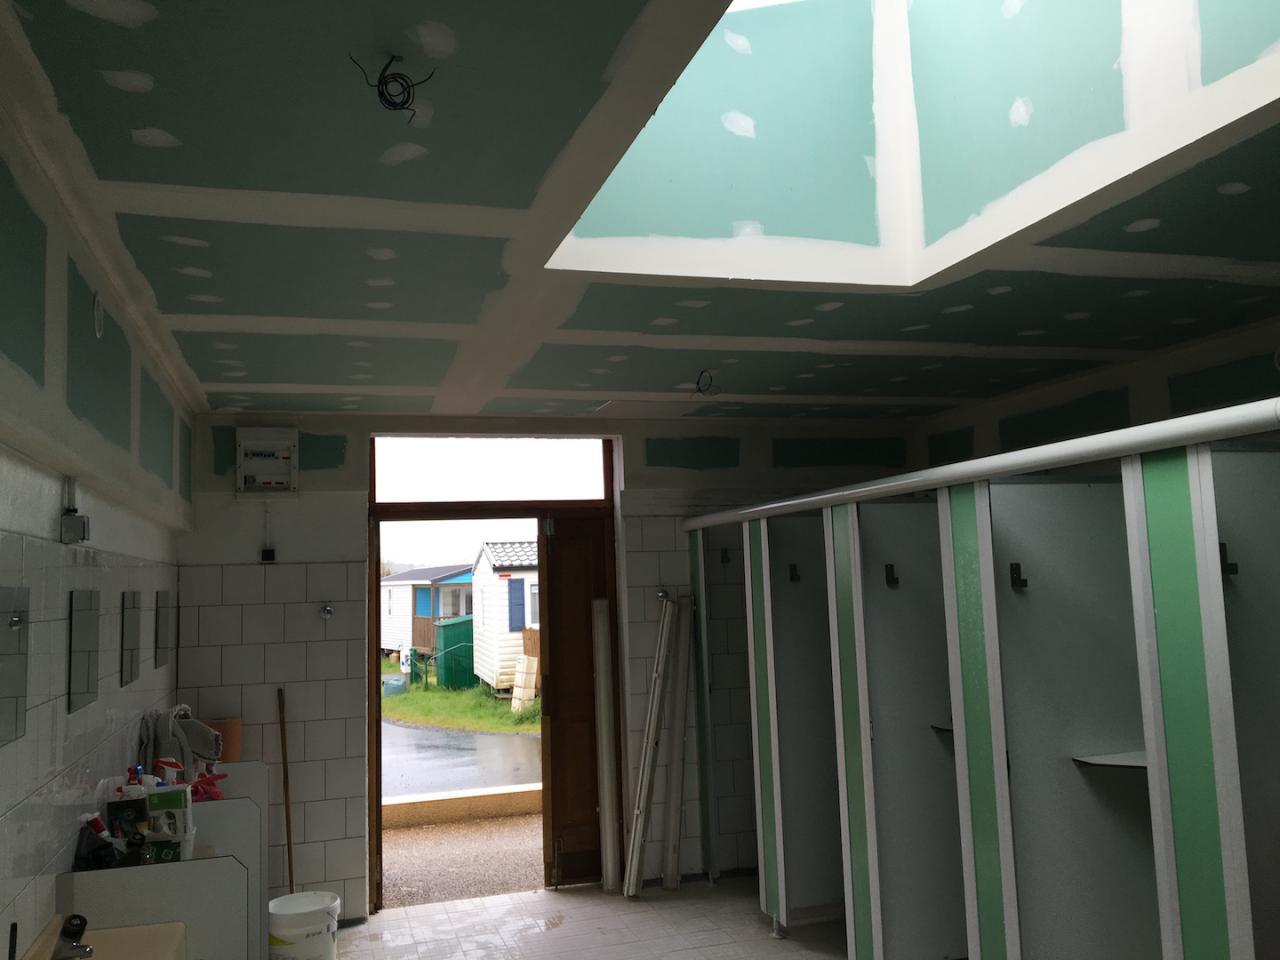 plafond placo hydro doublage hydro habillage puit de jour. Black Bedroom Furniture Sets. Home Design Ideas